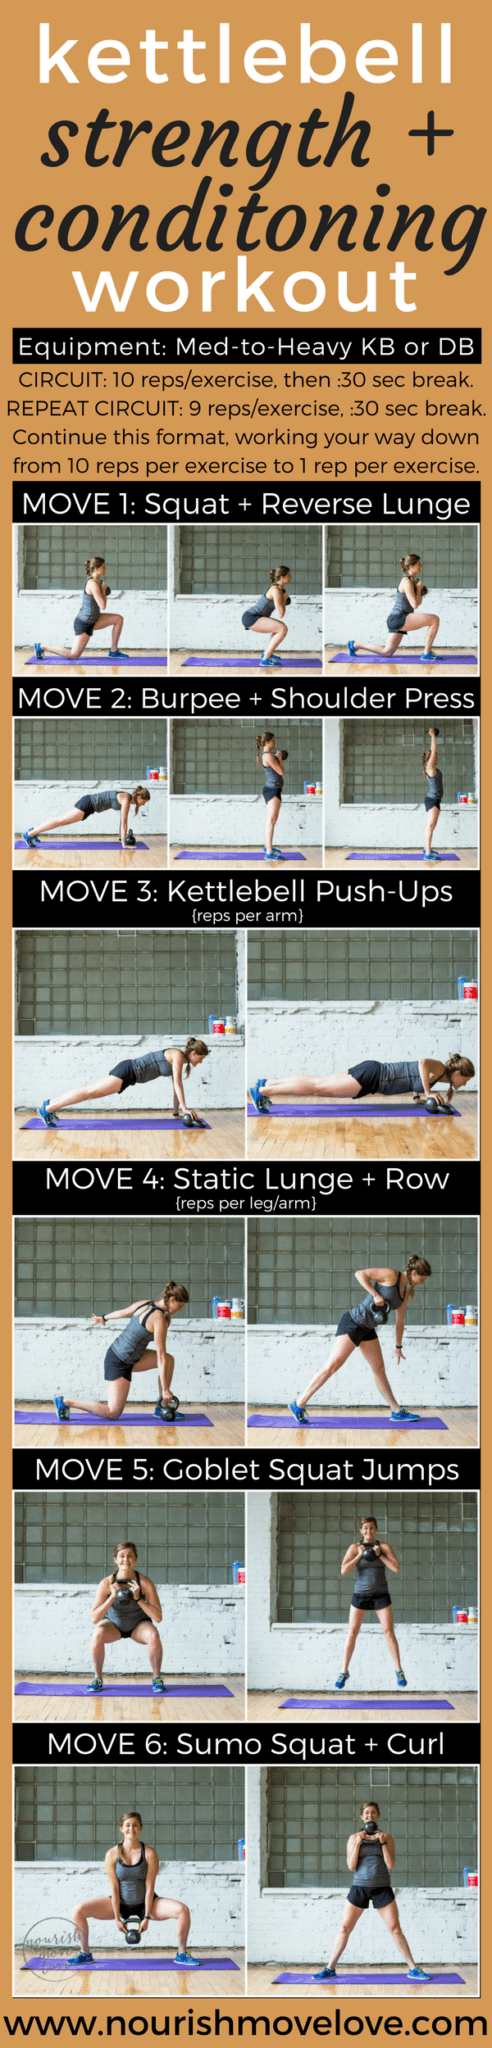 Strength + Conditioning Kettlebell Workout | www.nourishmovelove.com